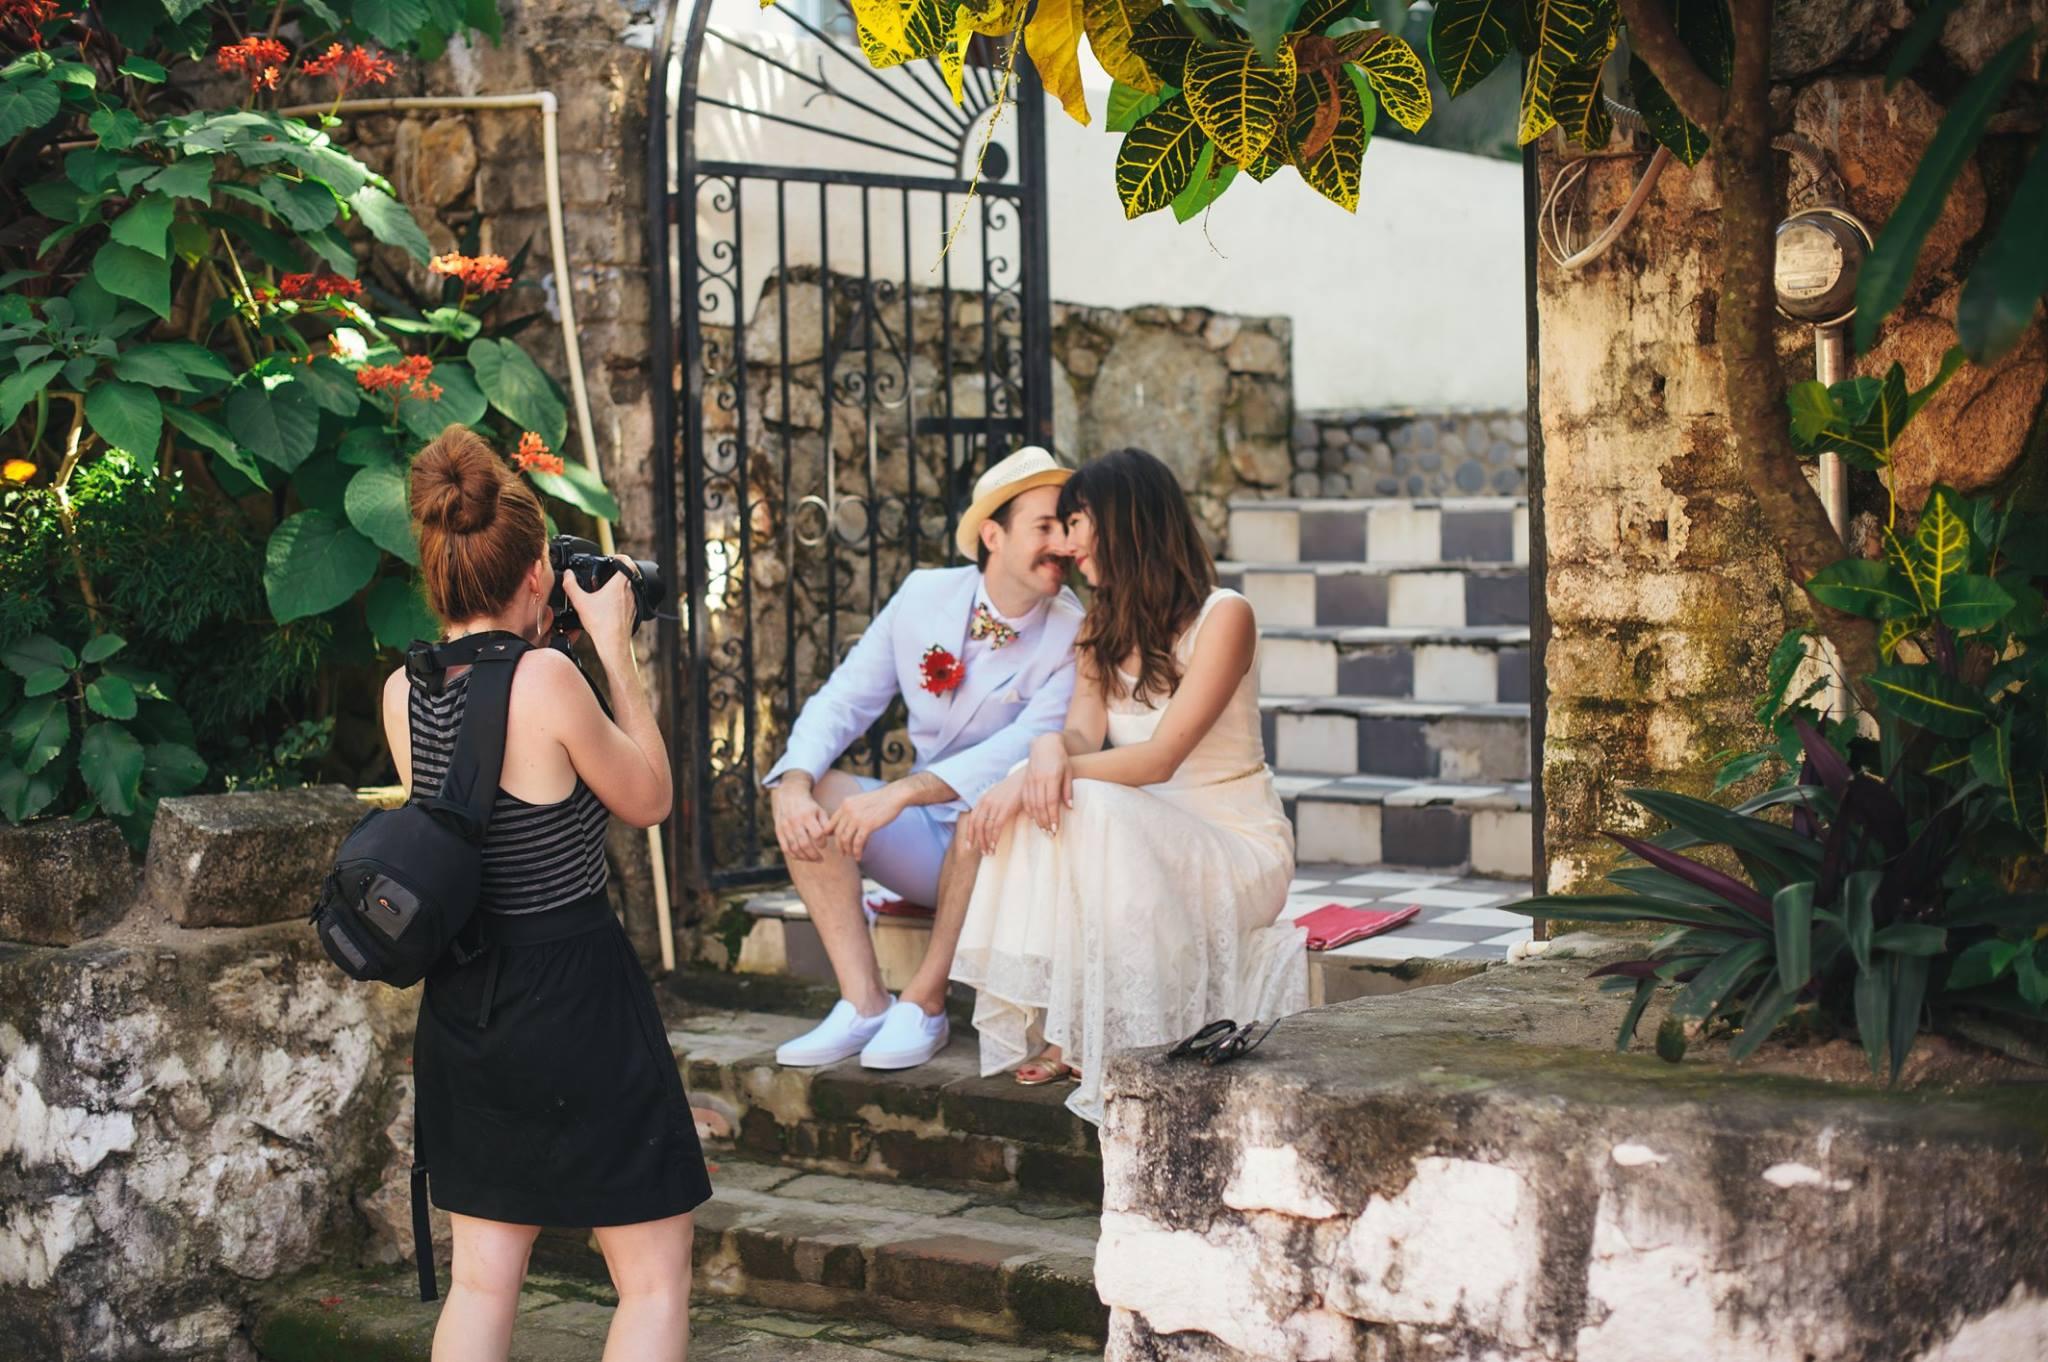 maggie-kirkland-honeysuckle-photography-yelapa-mexico-destination-travel-wedding-photographer.jpg